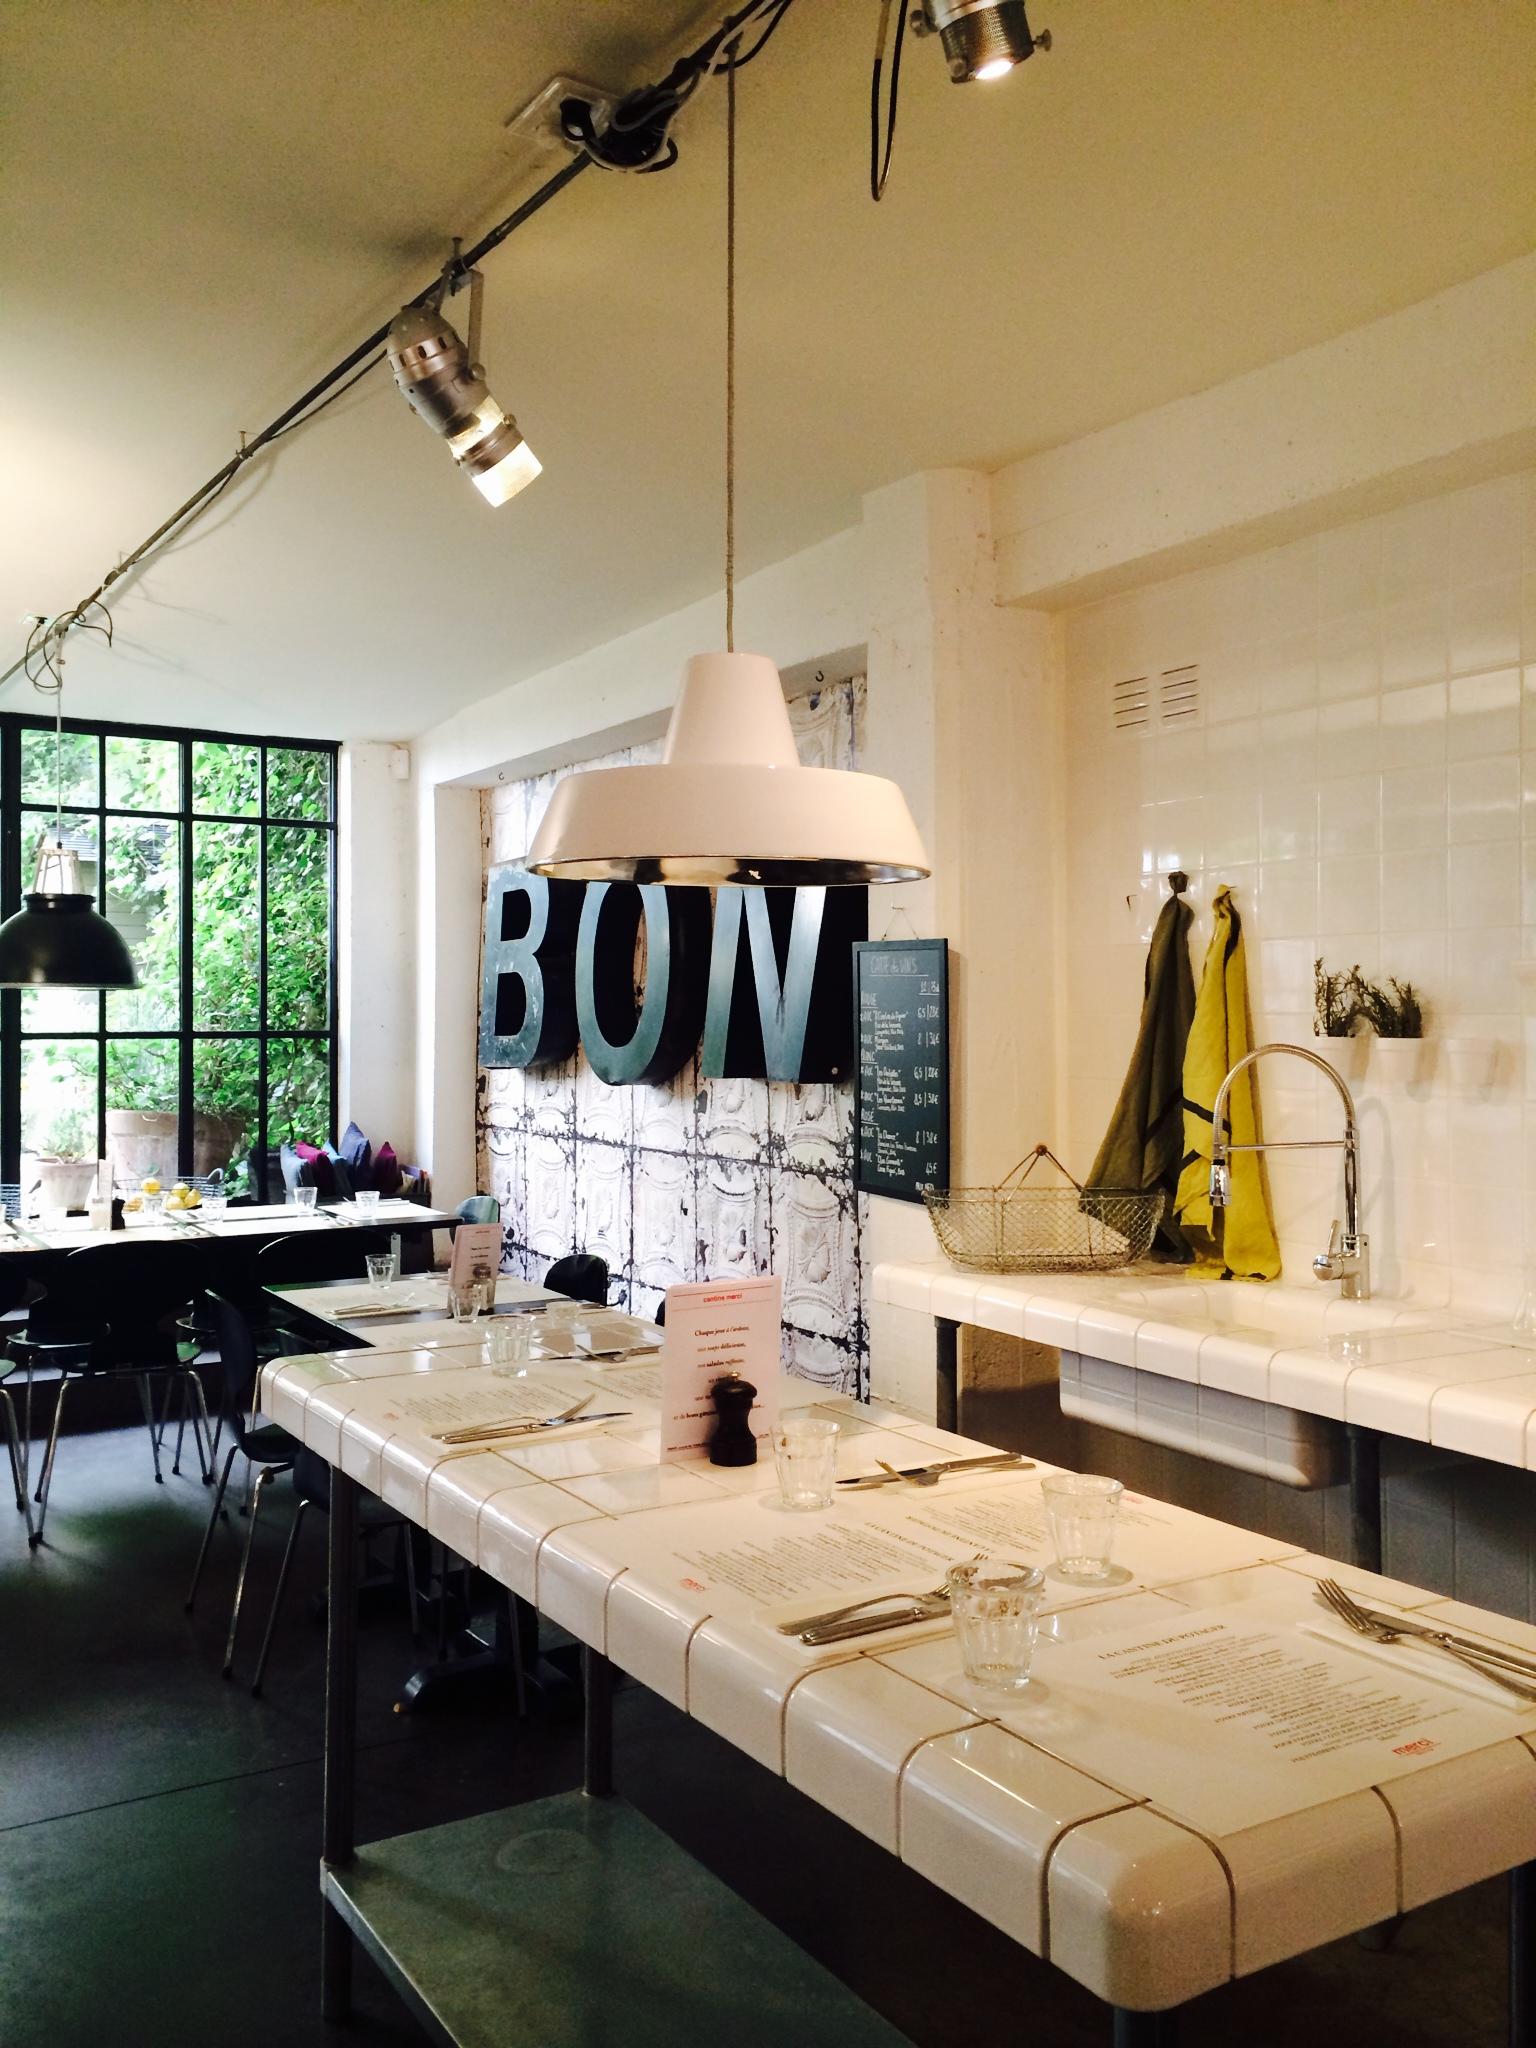 paris visit to merci concept store spoonful of home design. Black Bedroom Furniture Sets. Home Design Ideas